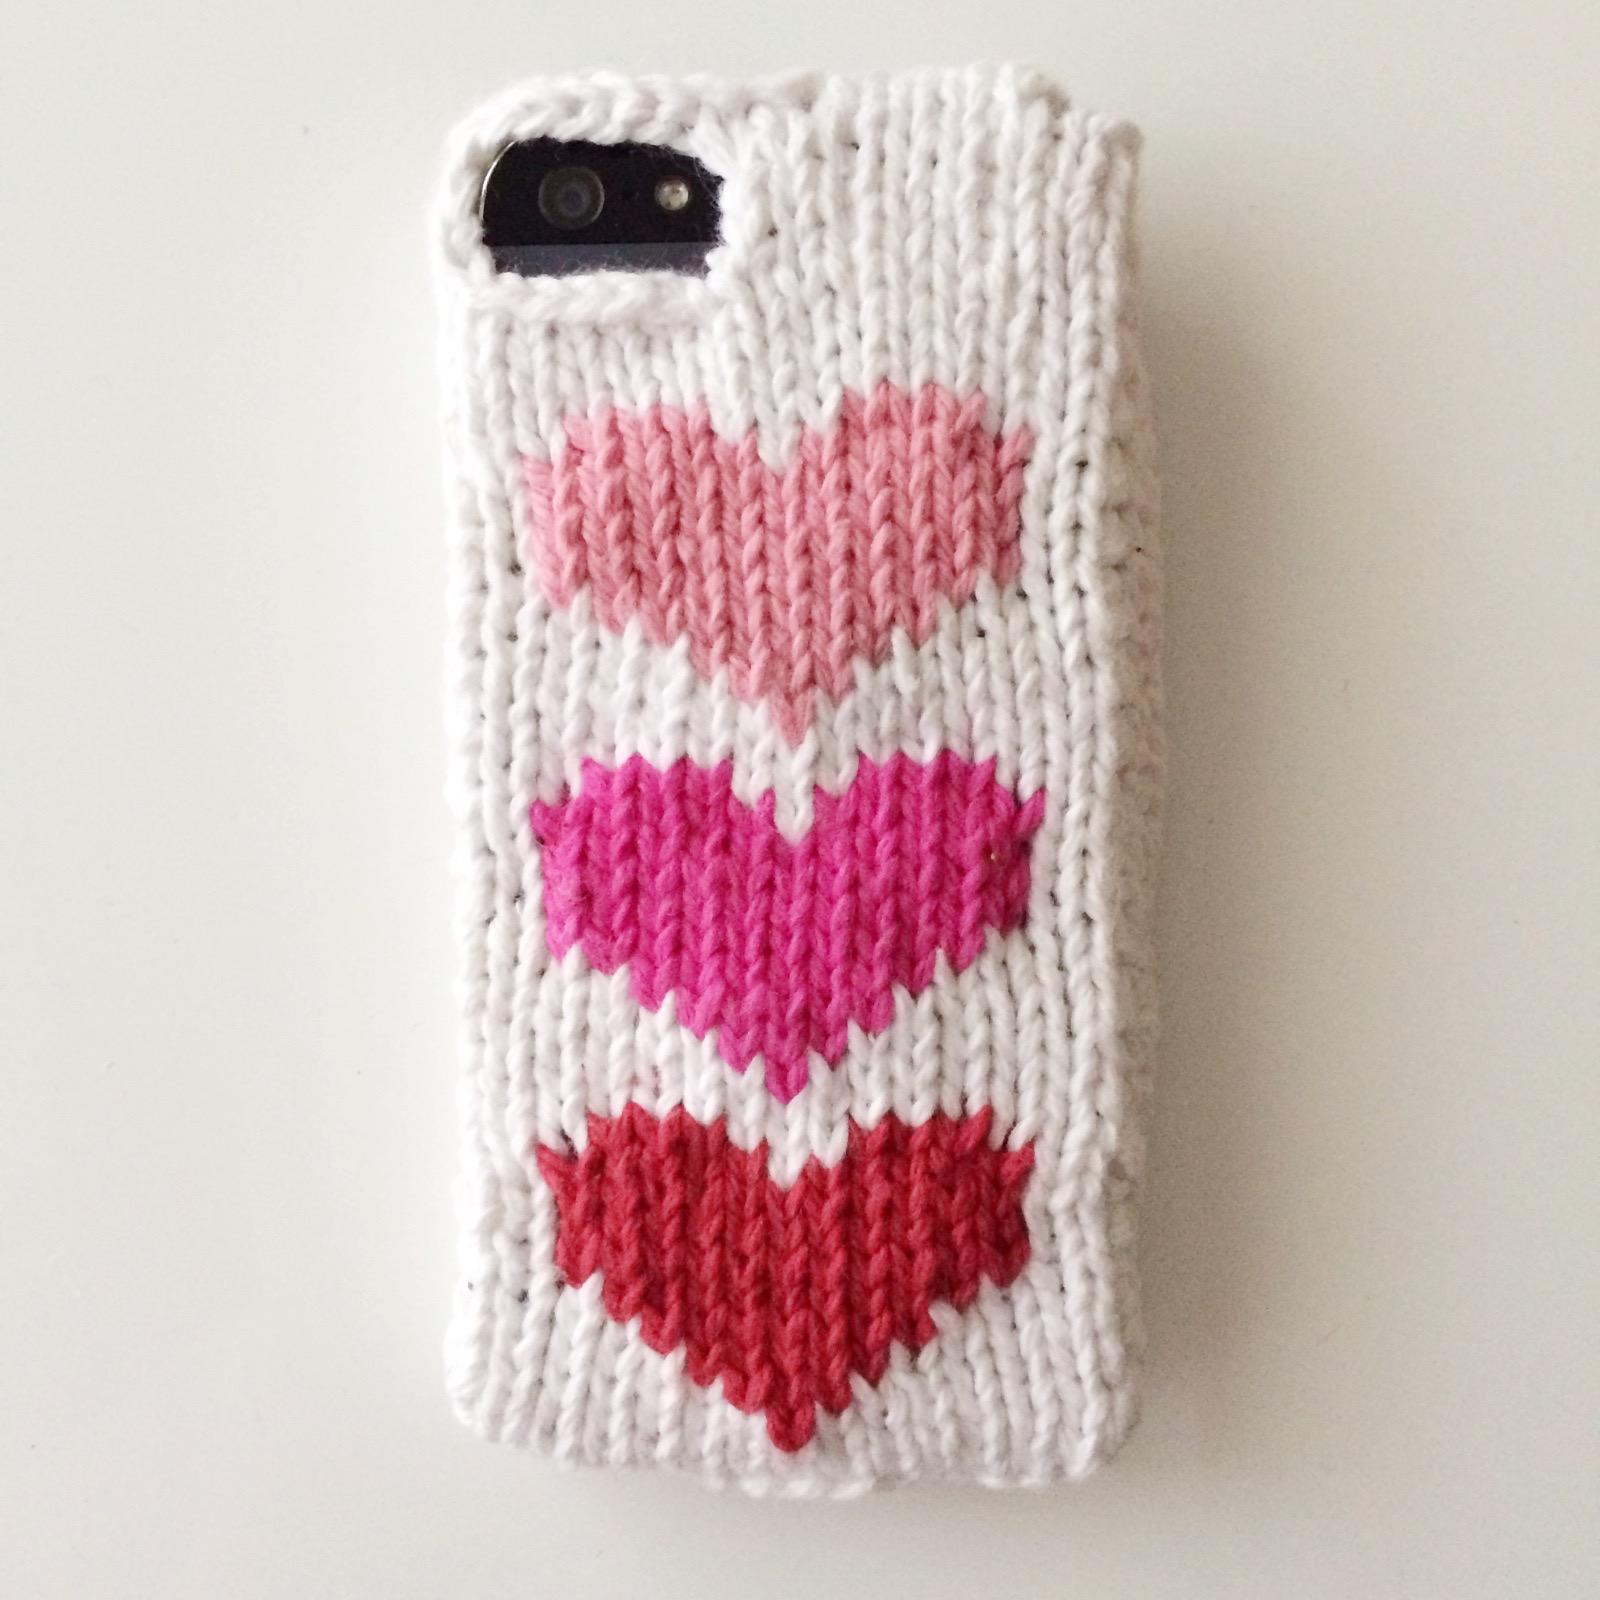 The Original Knit iPhone Sweater